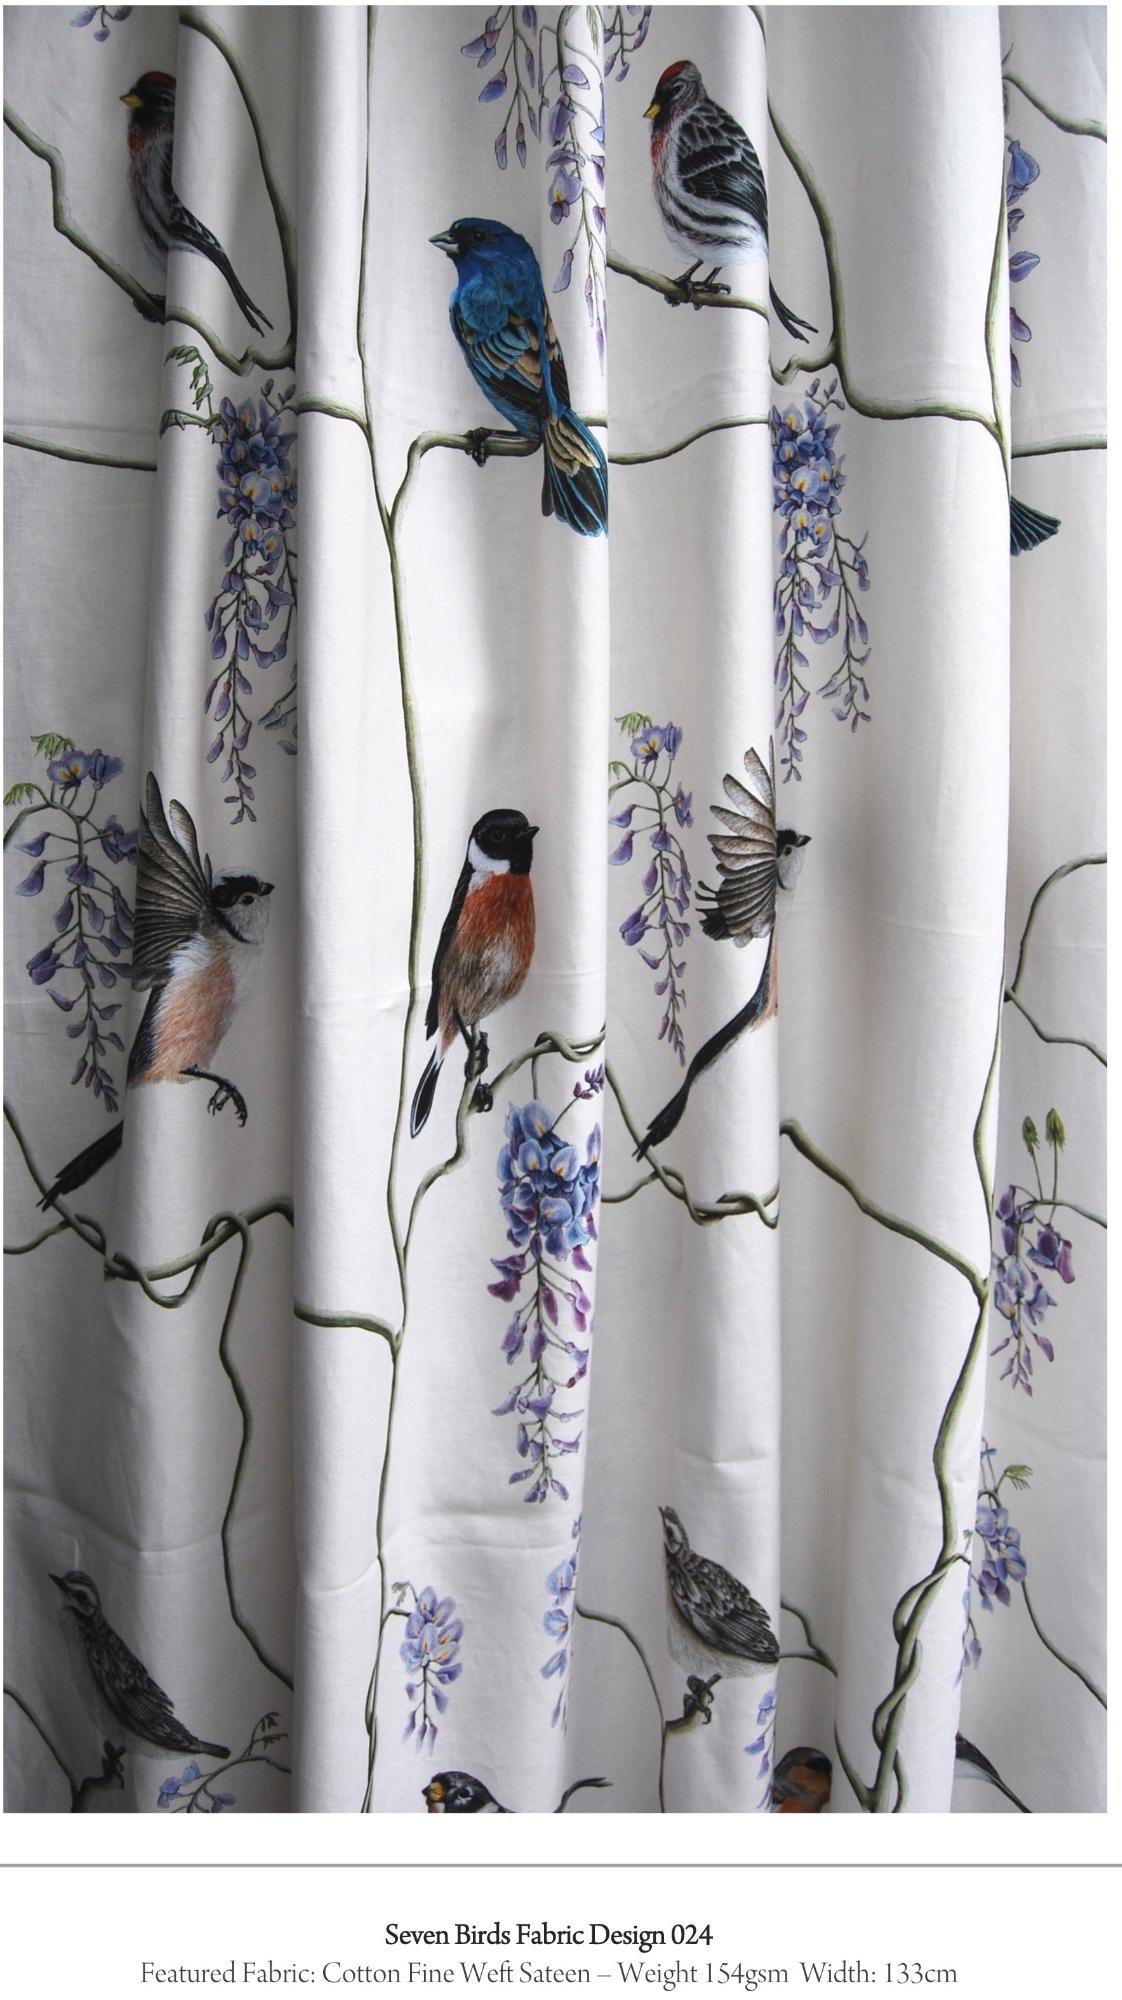 wisteria fabric